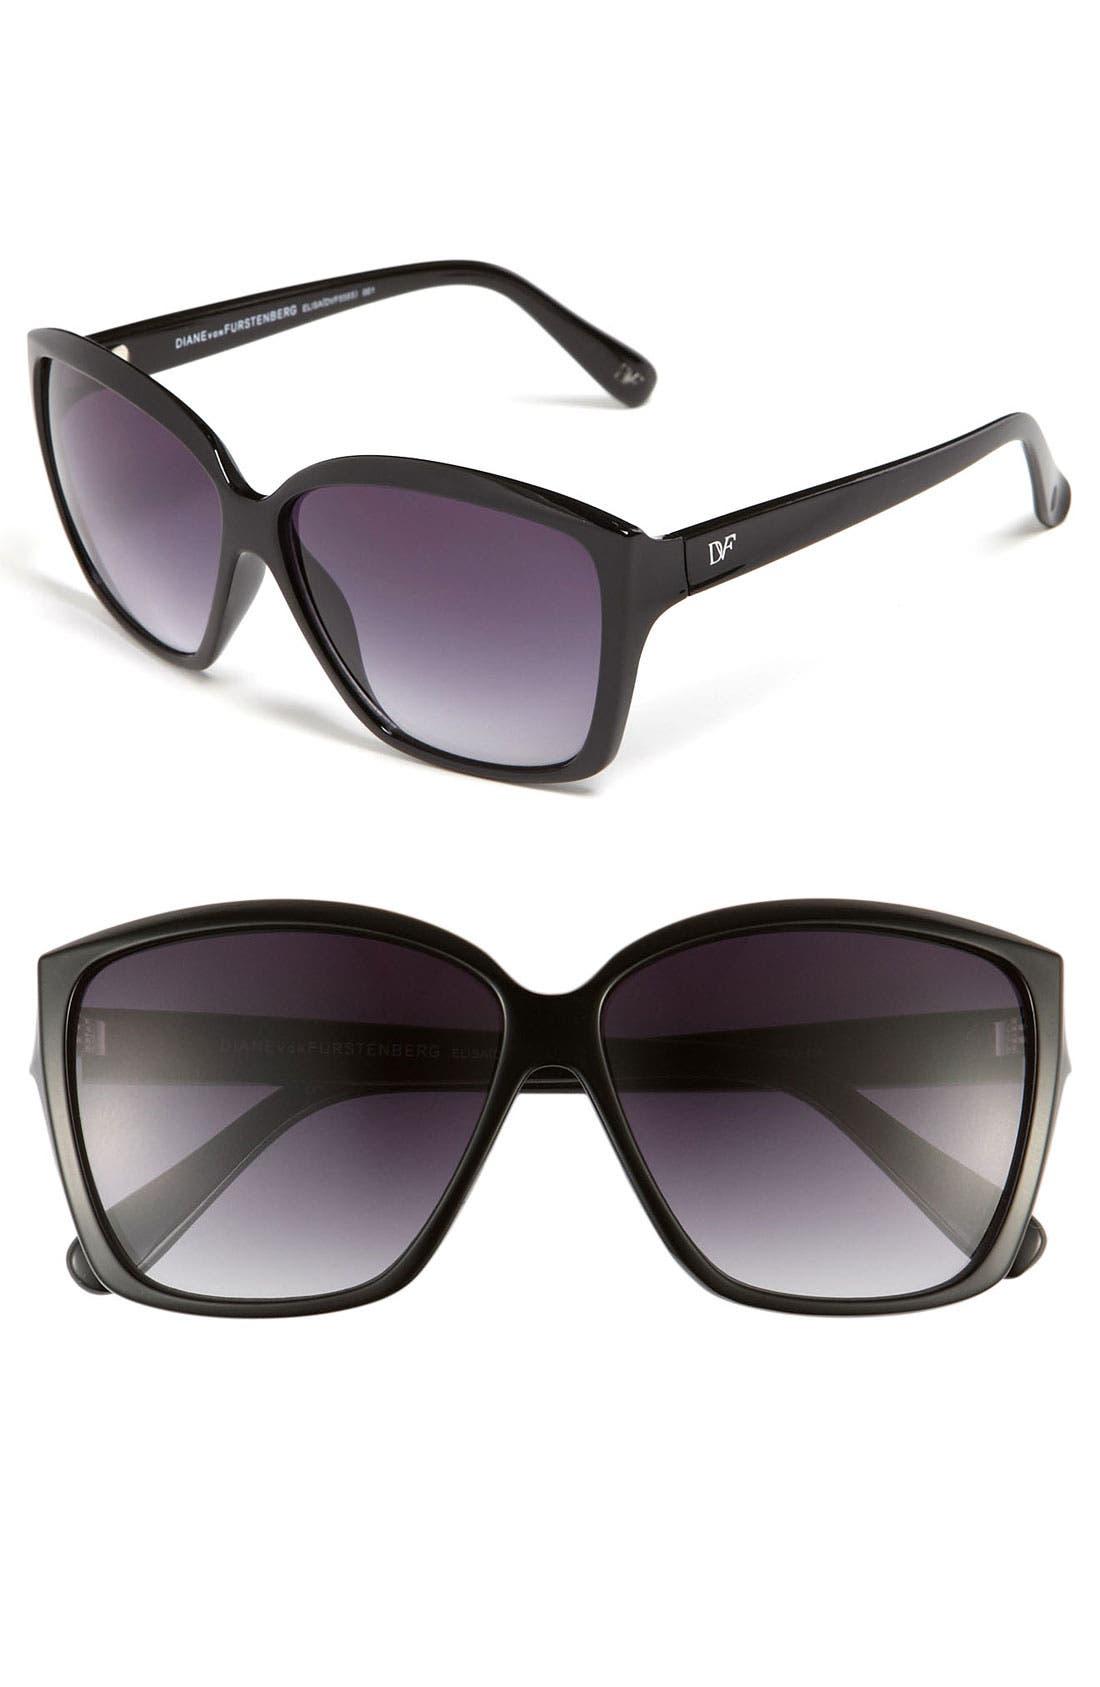 Main Image - Diane von Furstenberg Oversized Sunglasses